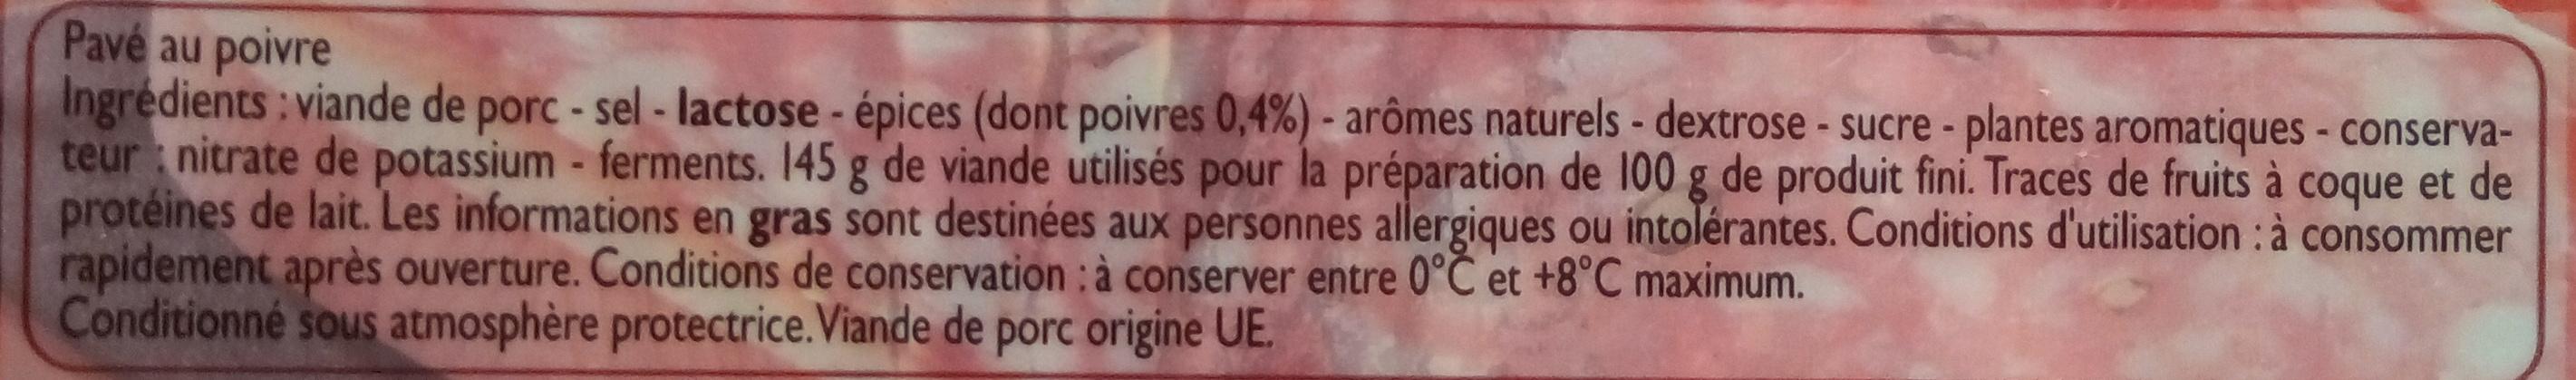 Pavé au poivre - Ingredienti - fr